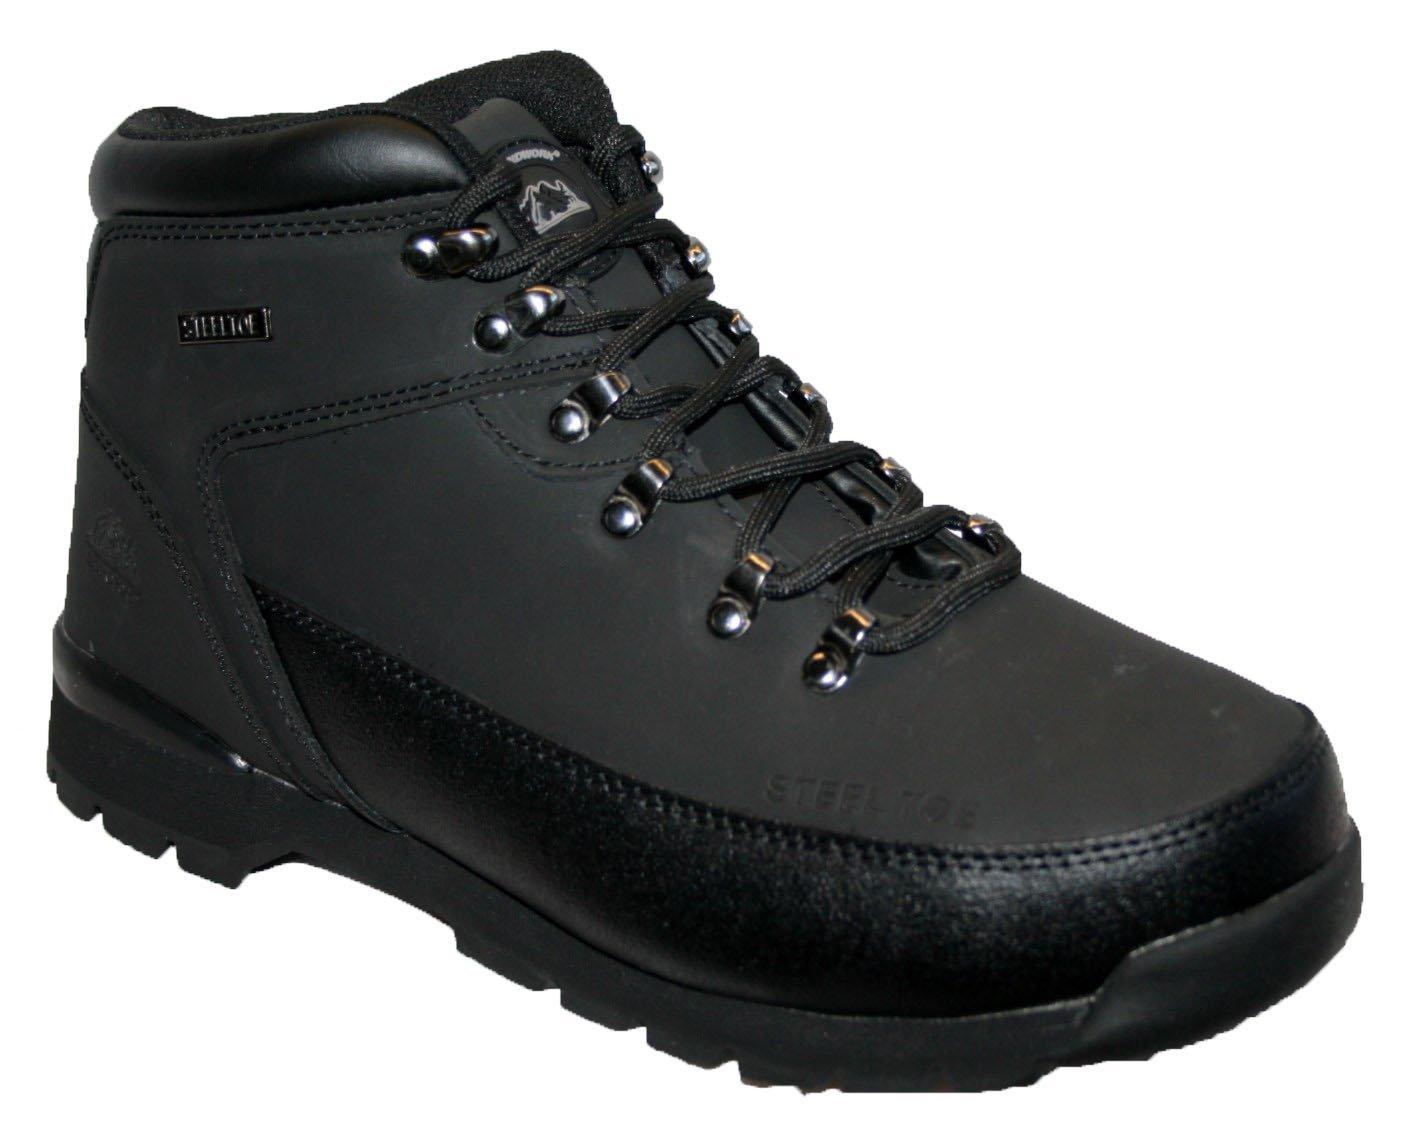 Groundwork GR66, Zapatos de Seguridad Unisex, Negro, 44 EU (10 UK)